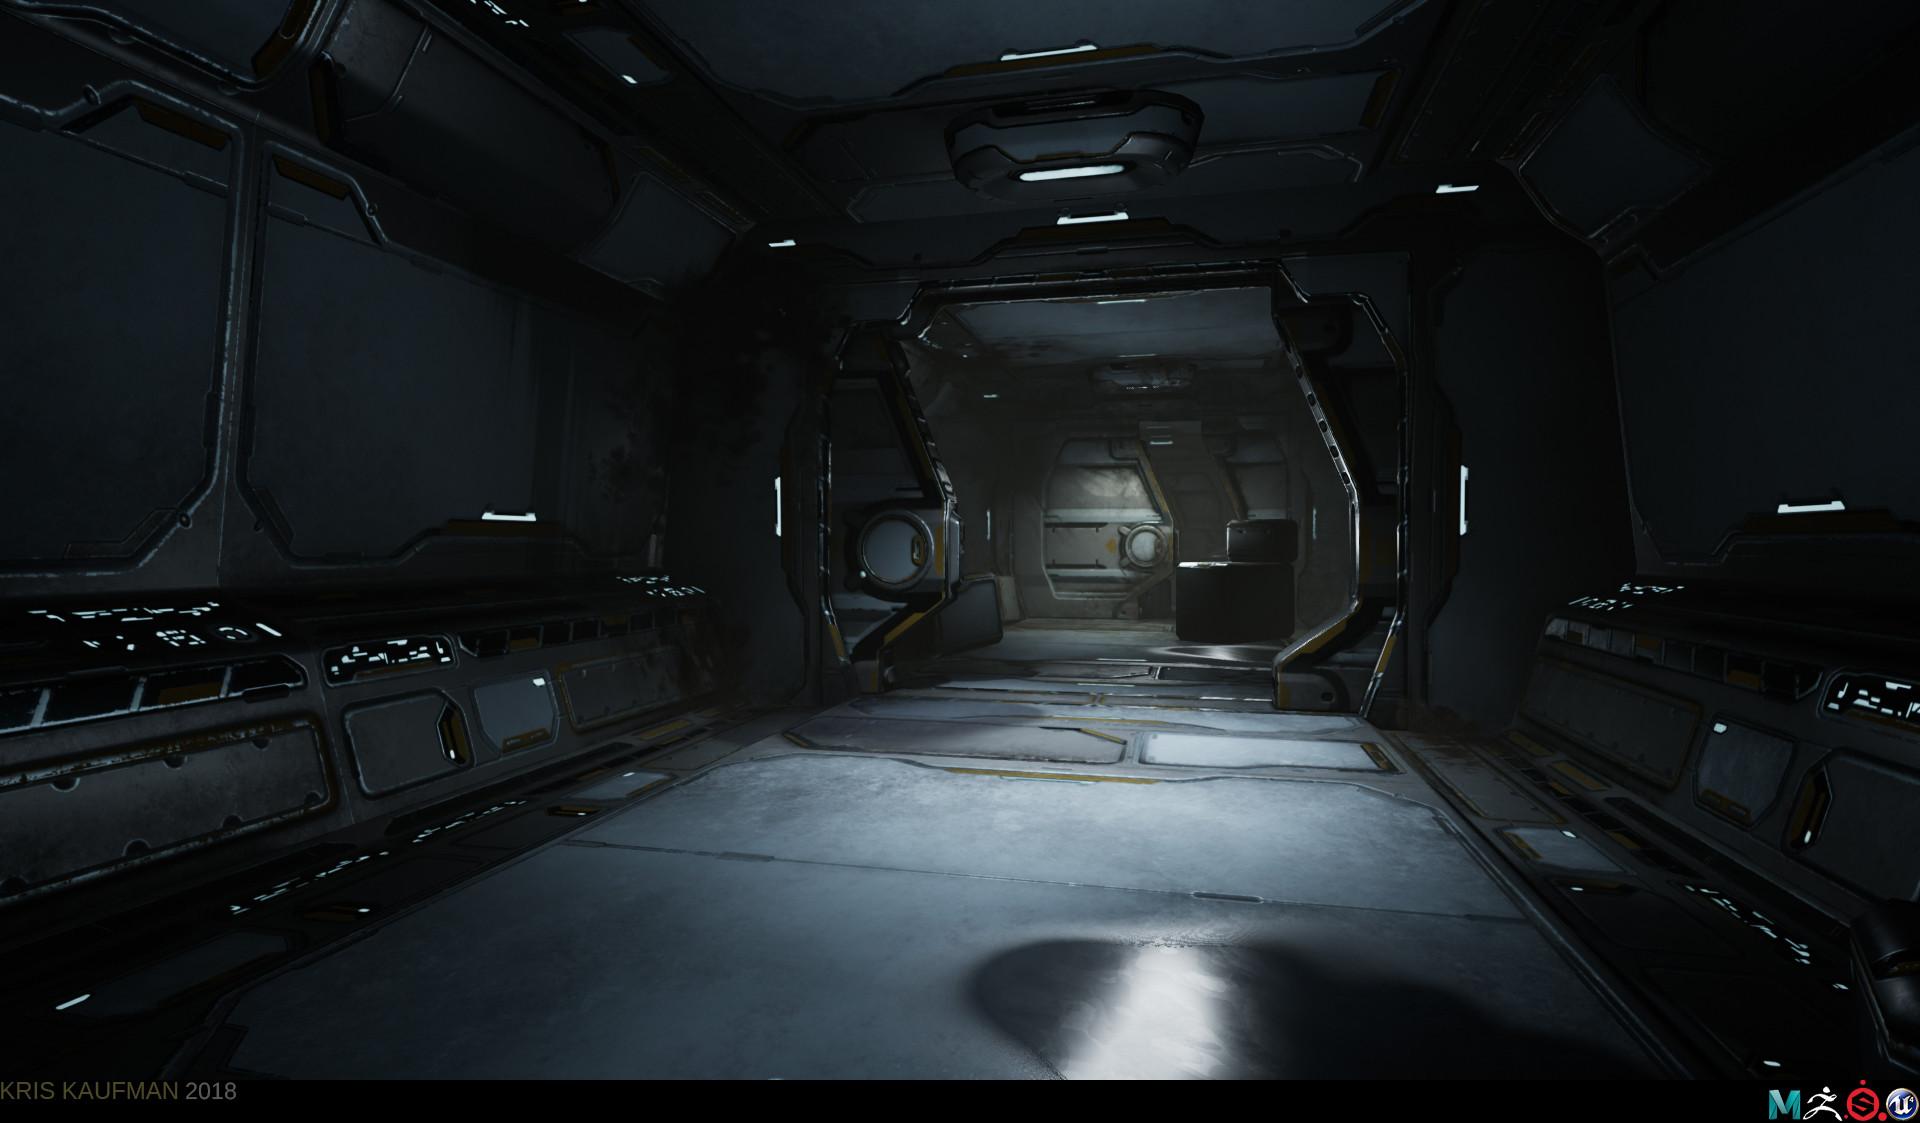 Kris kaufman corridor 01